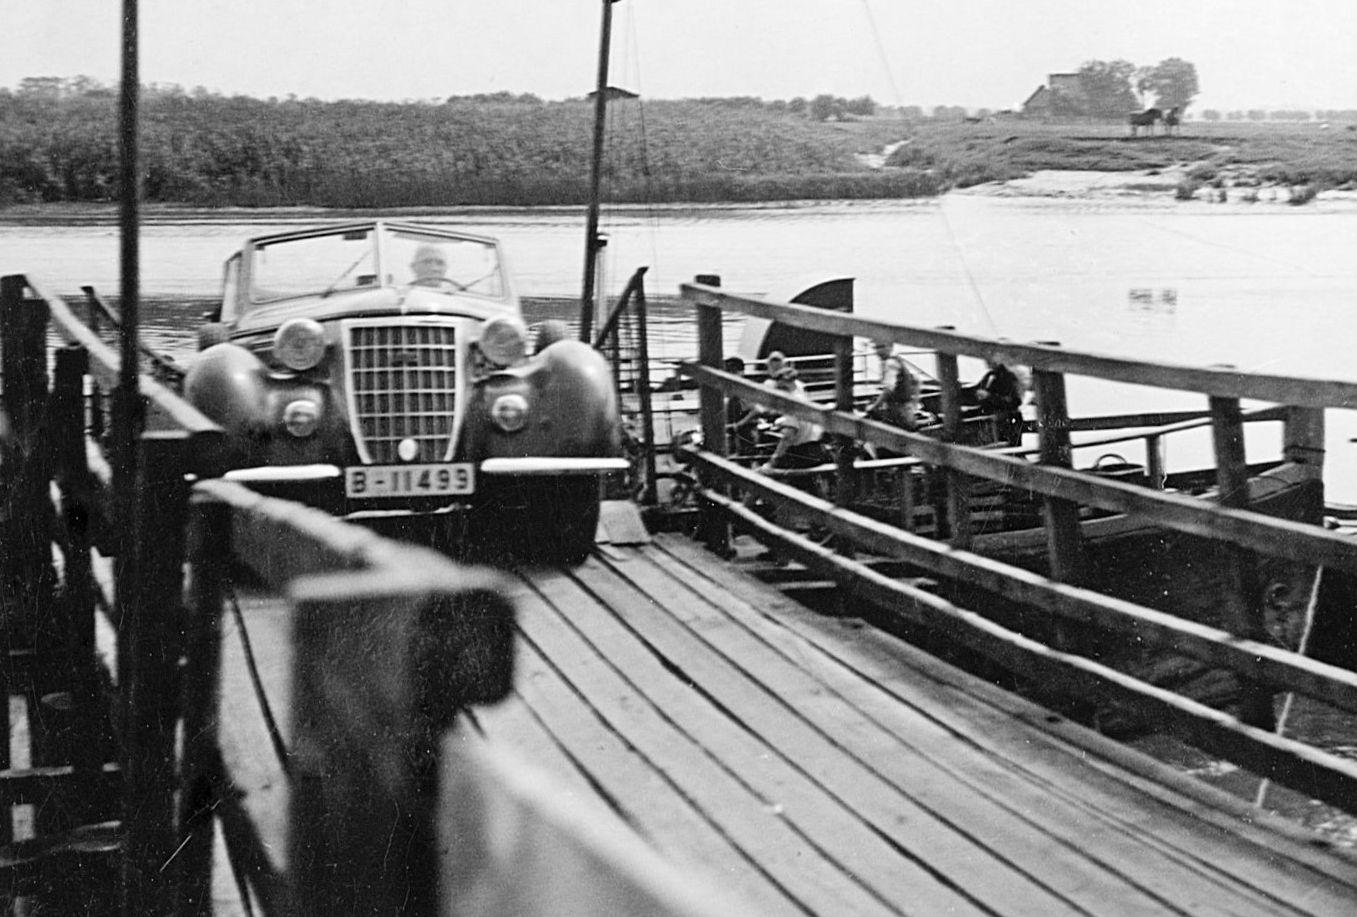 Wanderer_W51_oder_52_07-1937_Fähre Glückst.Wischhaf. Gießerei Gerhards_Seesener Fabrikant_via_W-D-Ternedde_Galerie